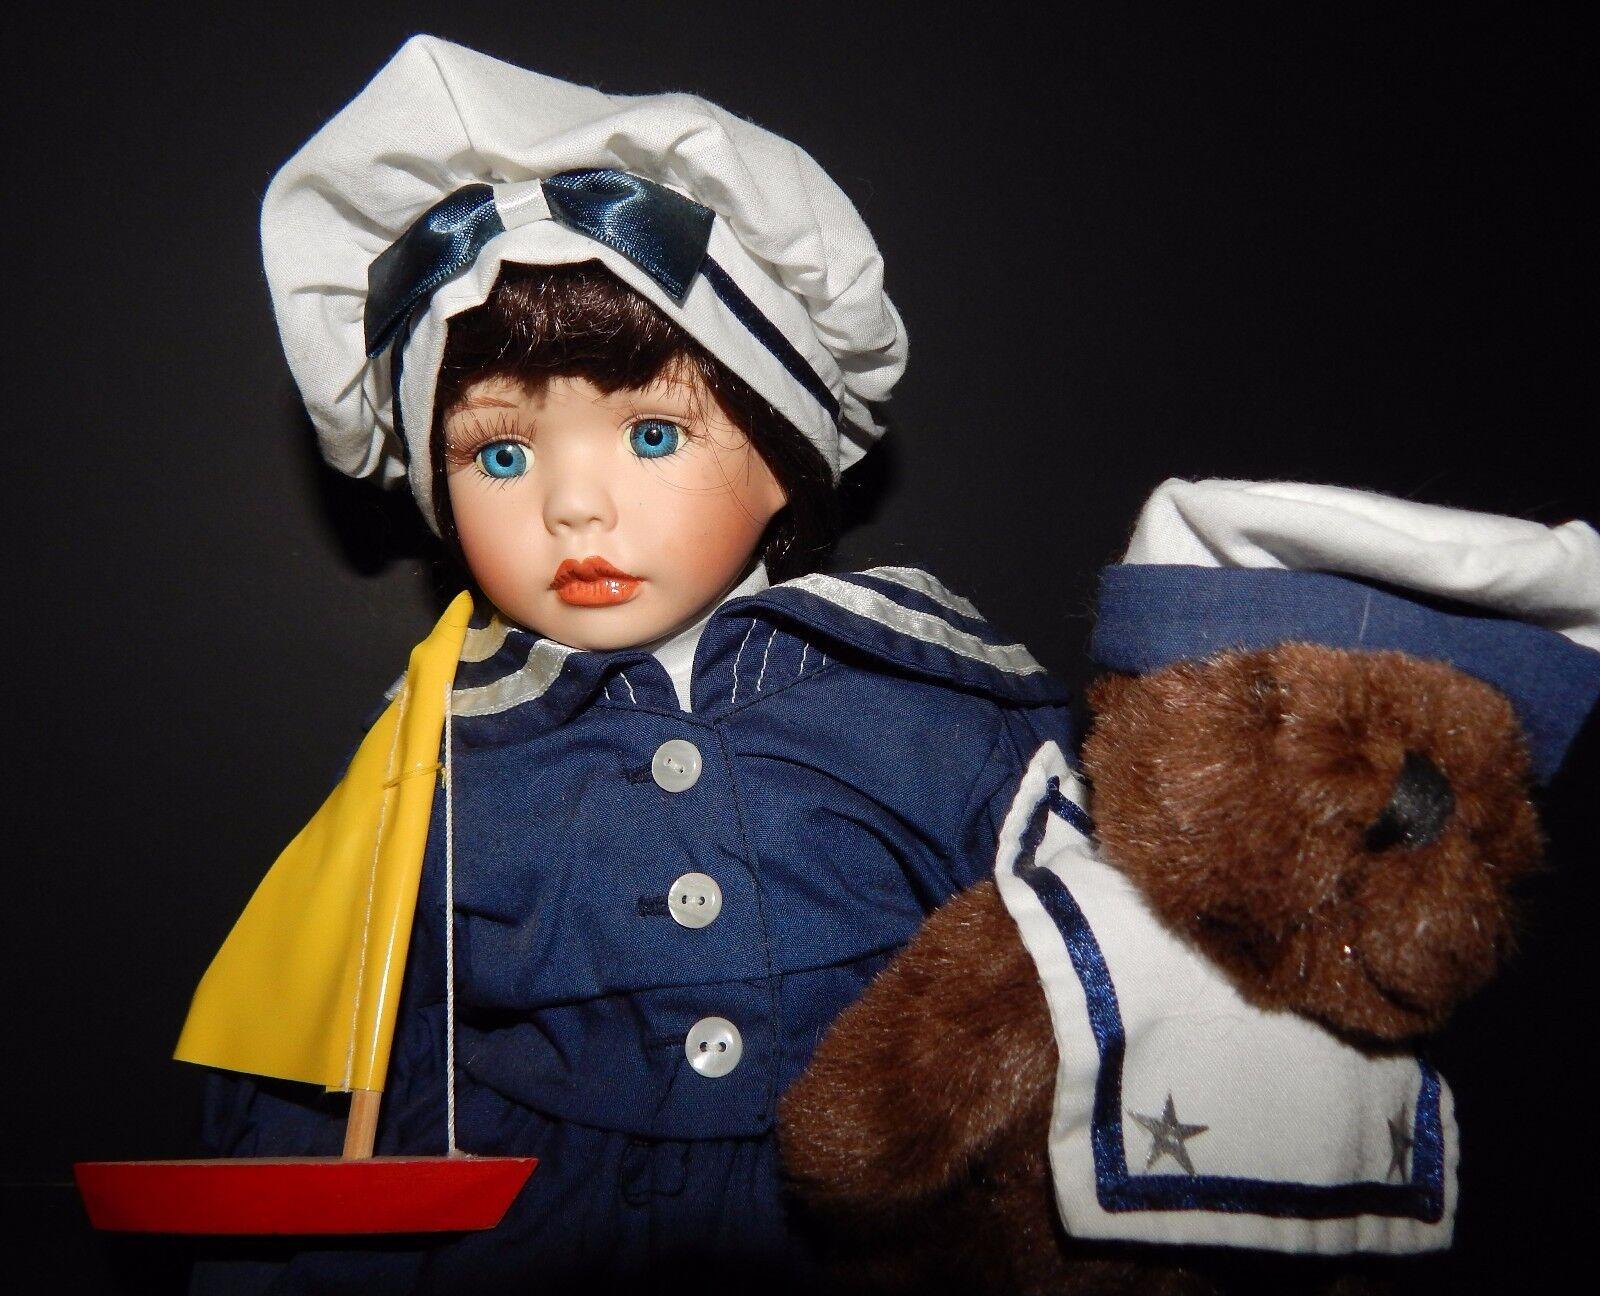 Heritage Signature Collection Sailor Doll Teddy Bear Sailboat blu bianca Dress